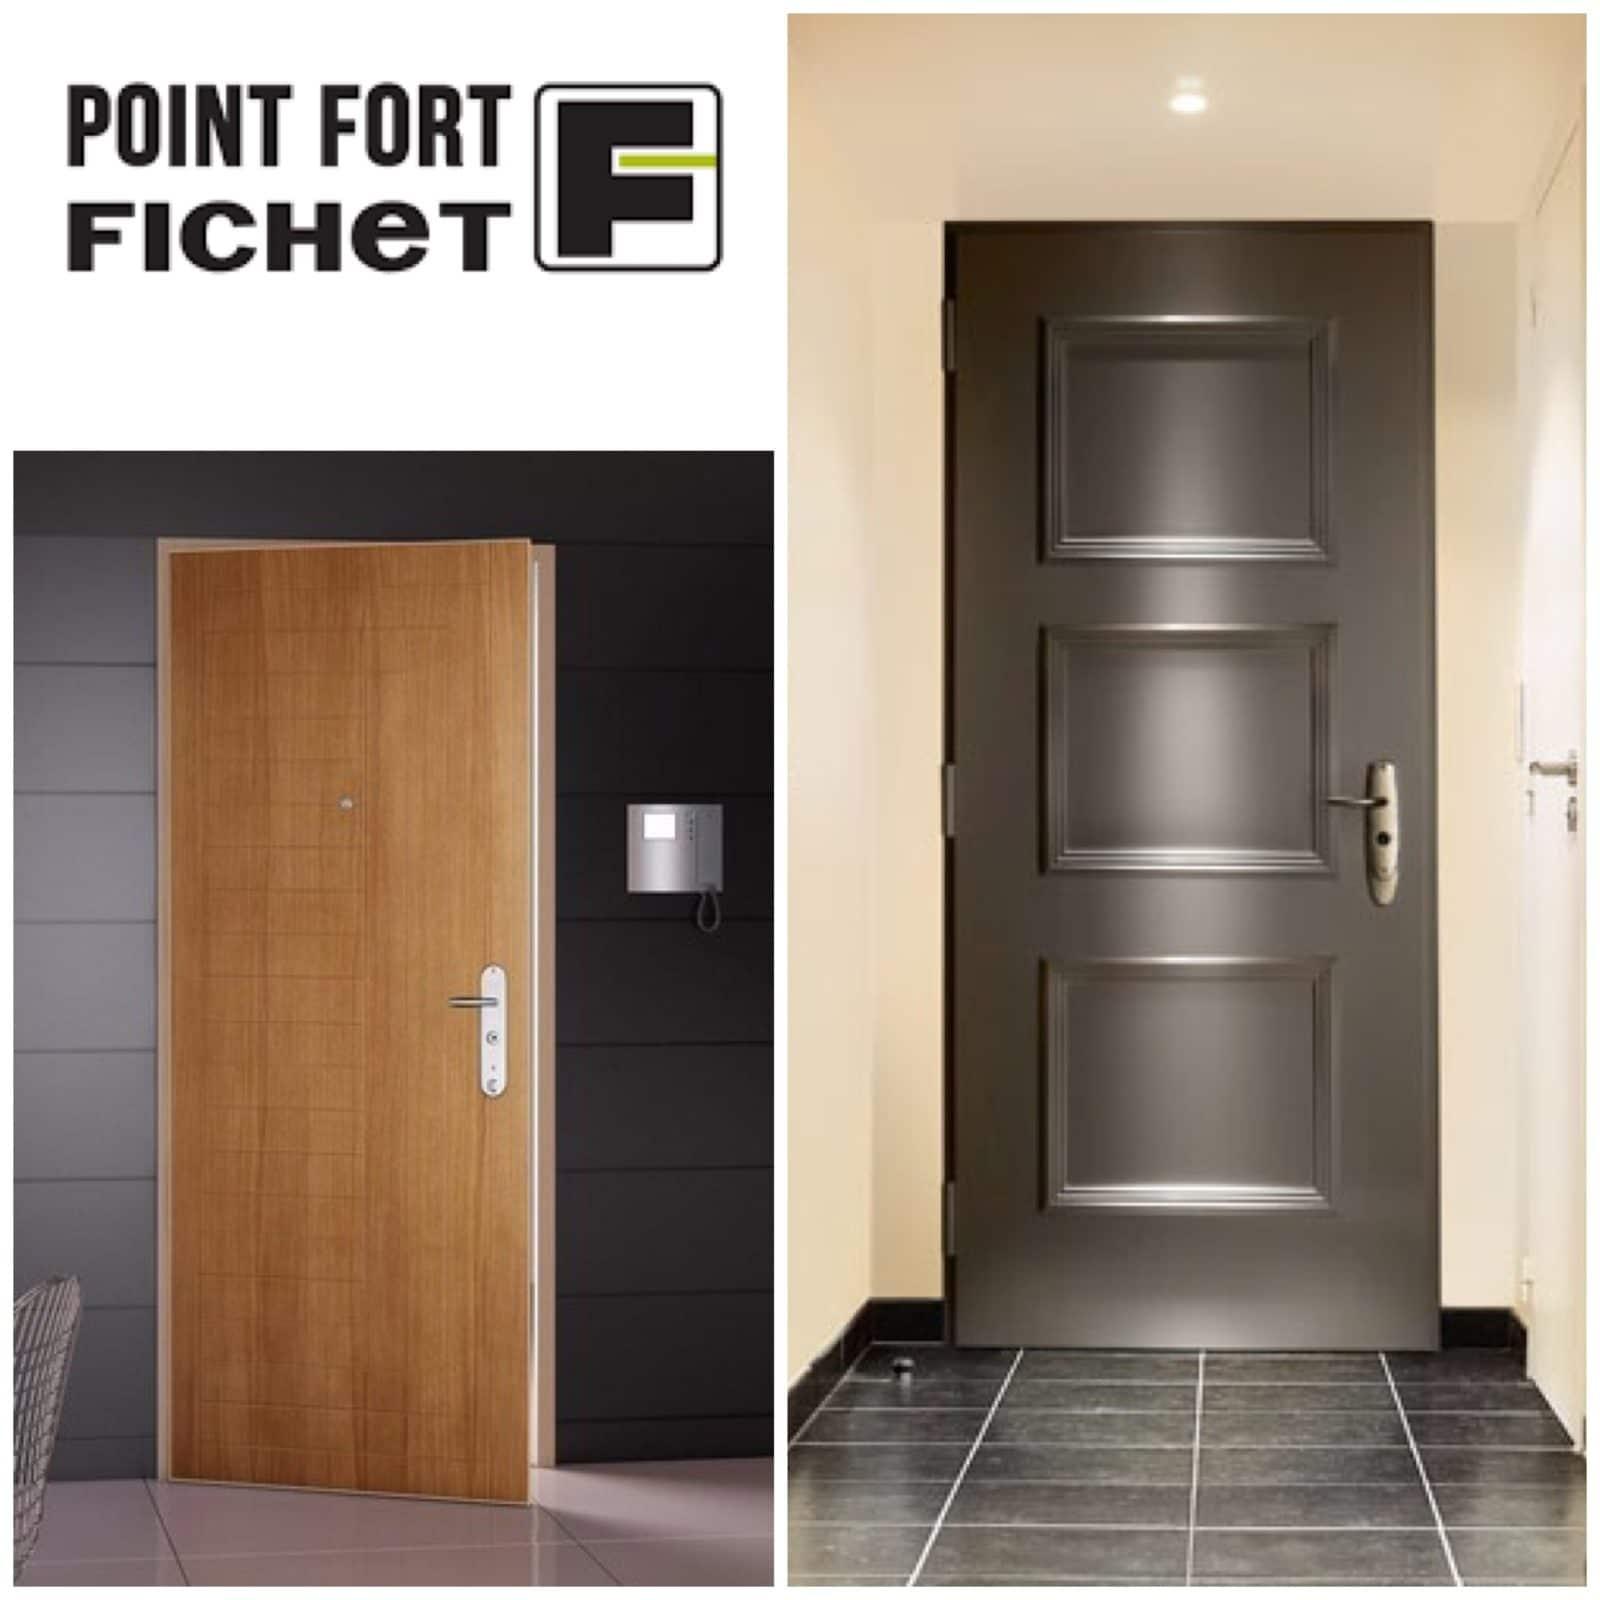 POINT FORT FICHET